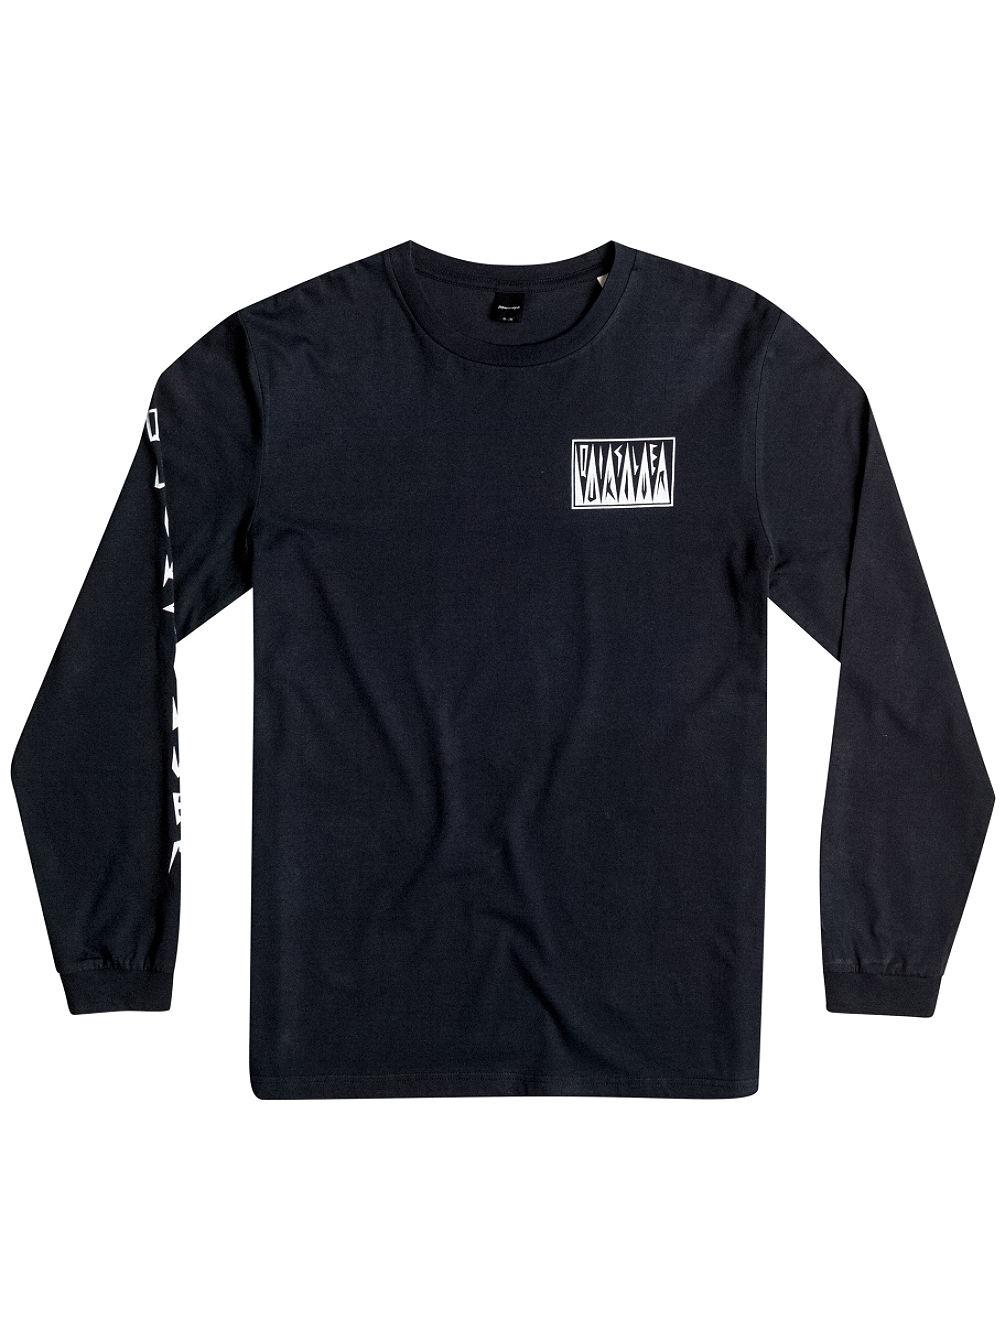 pm-afro-logo-t-shirt-ls